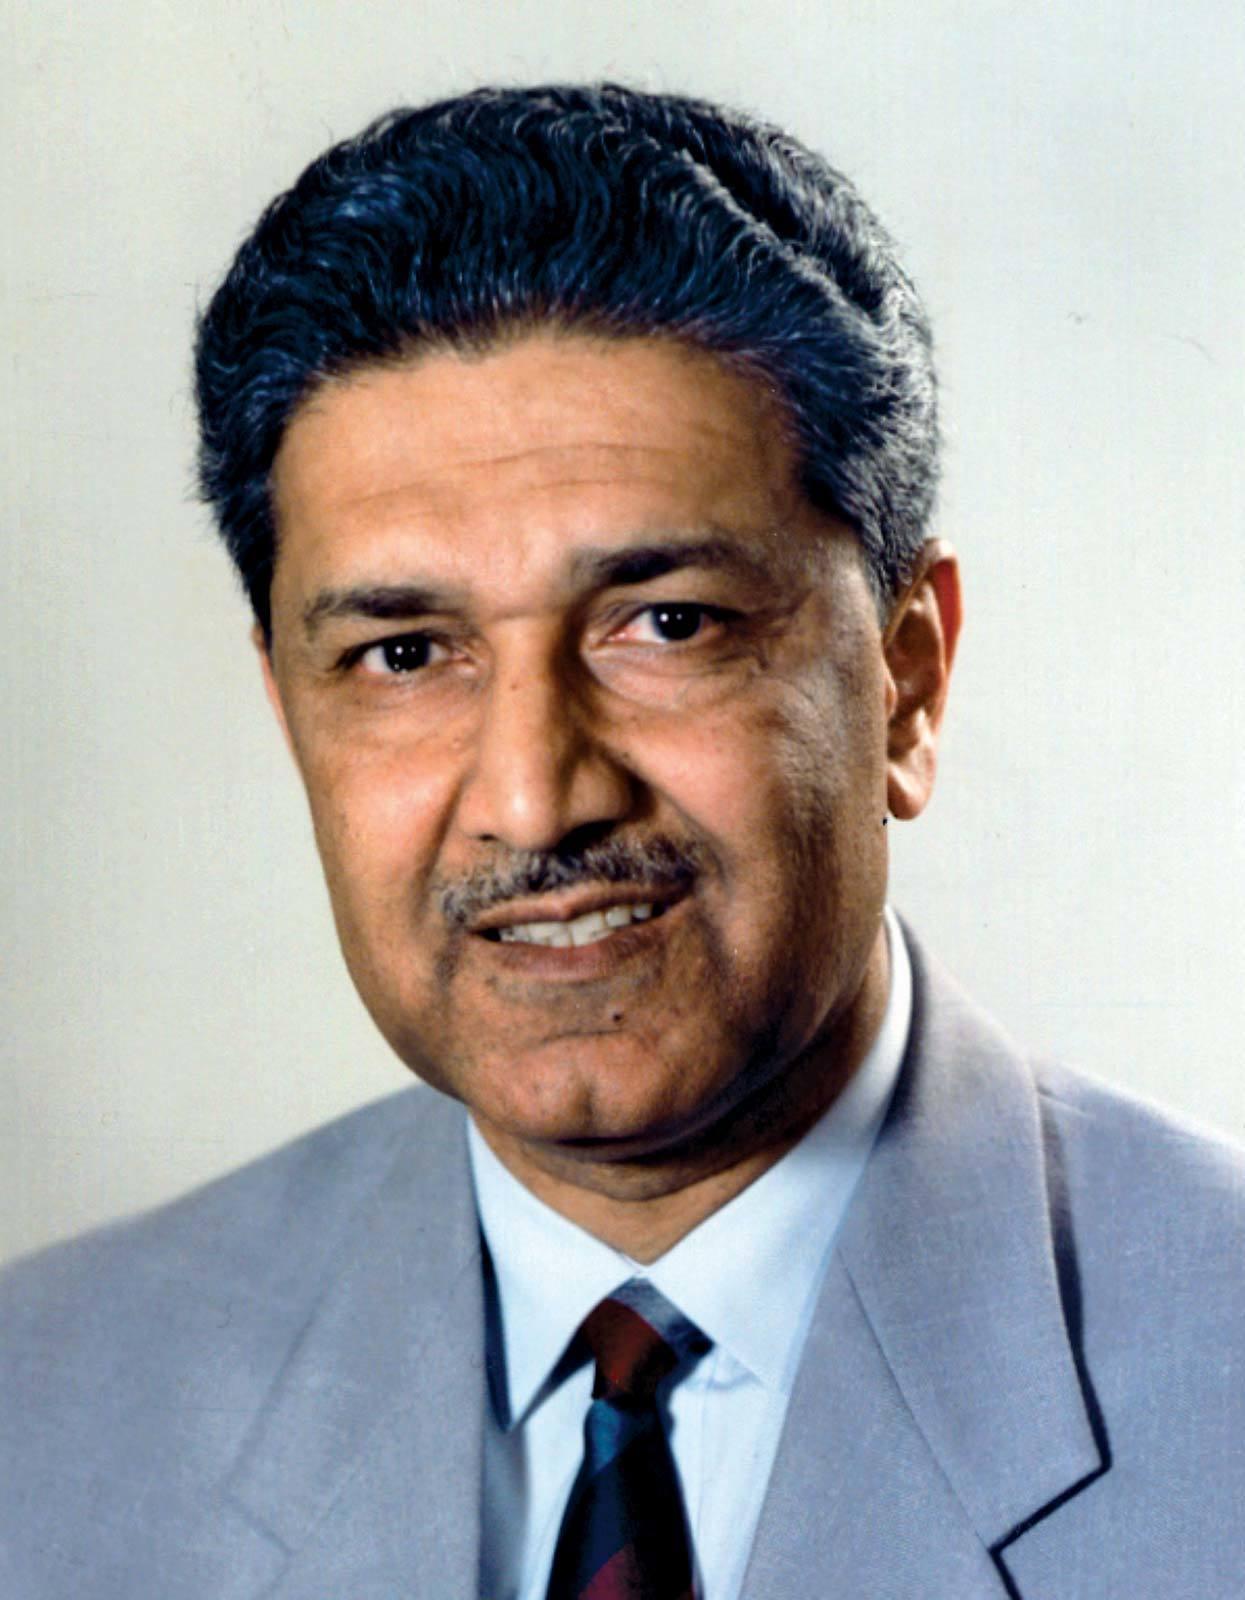 Абдул Кадыр Хан